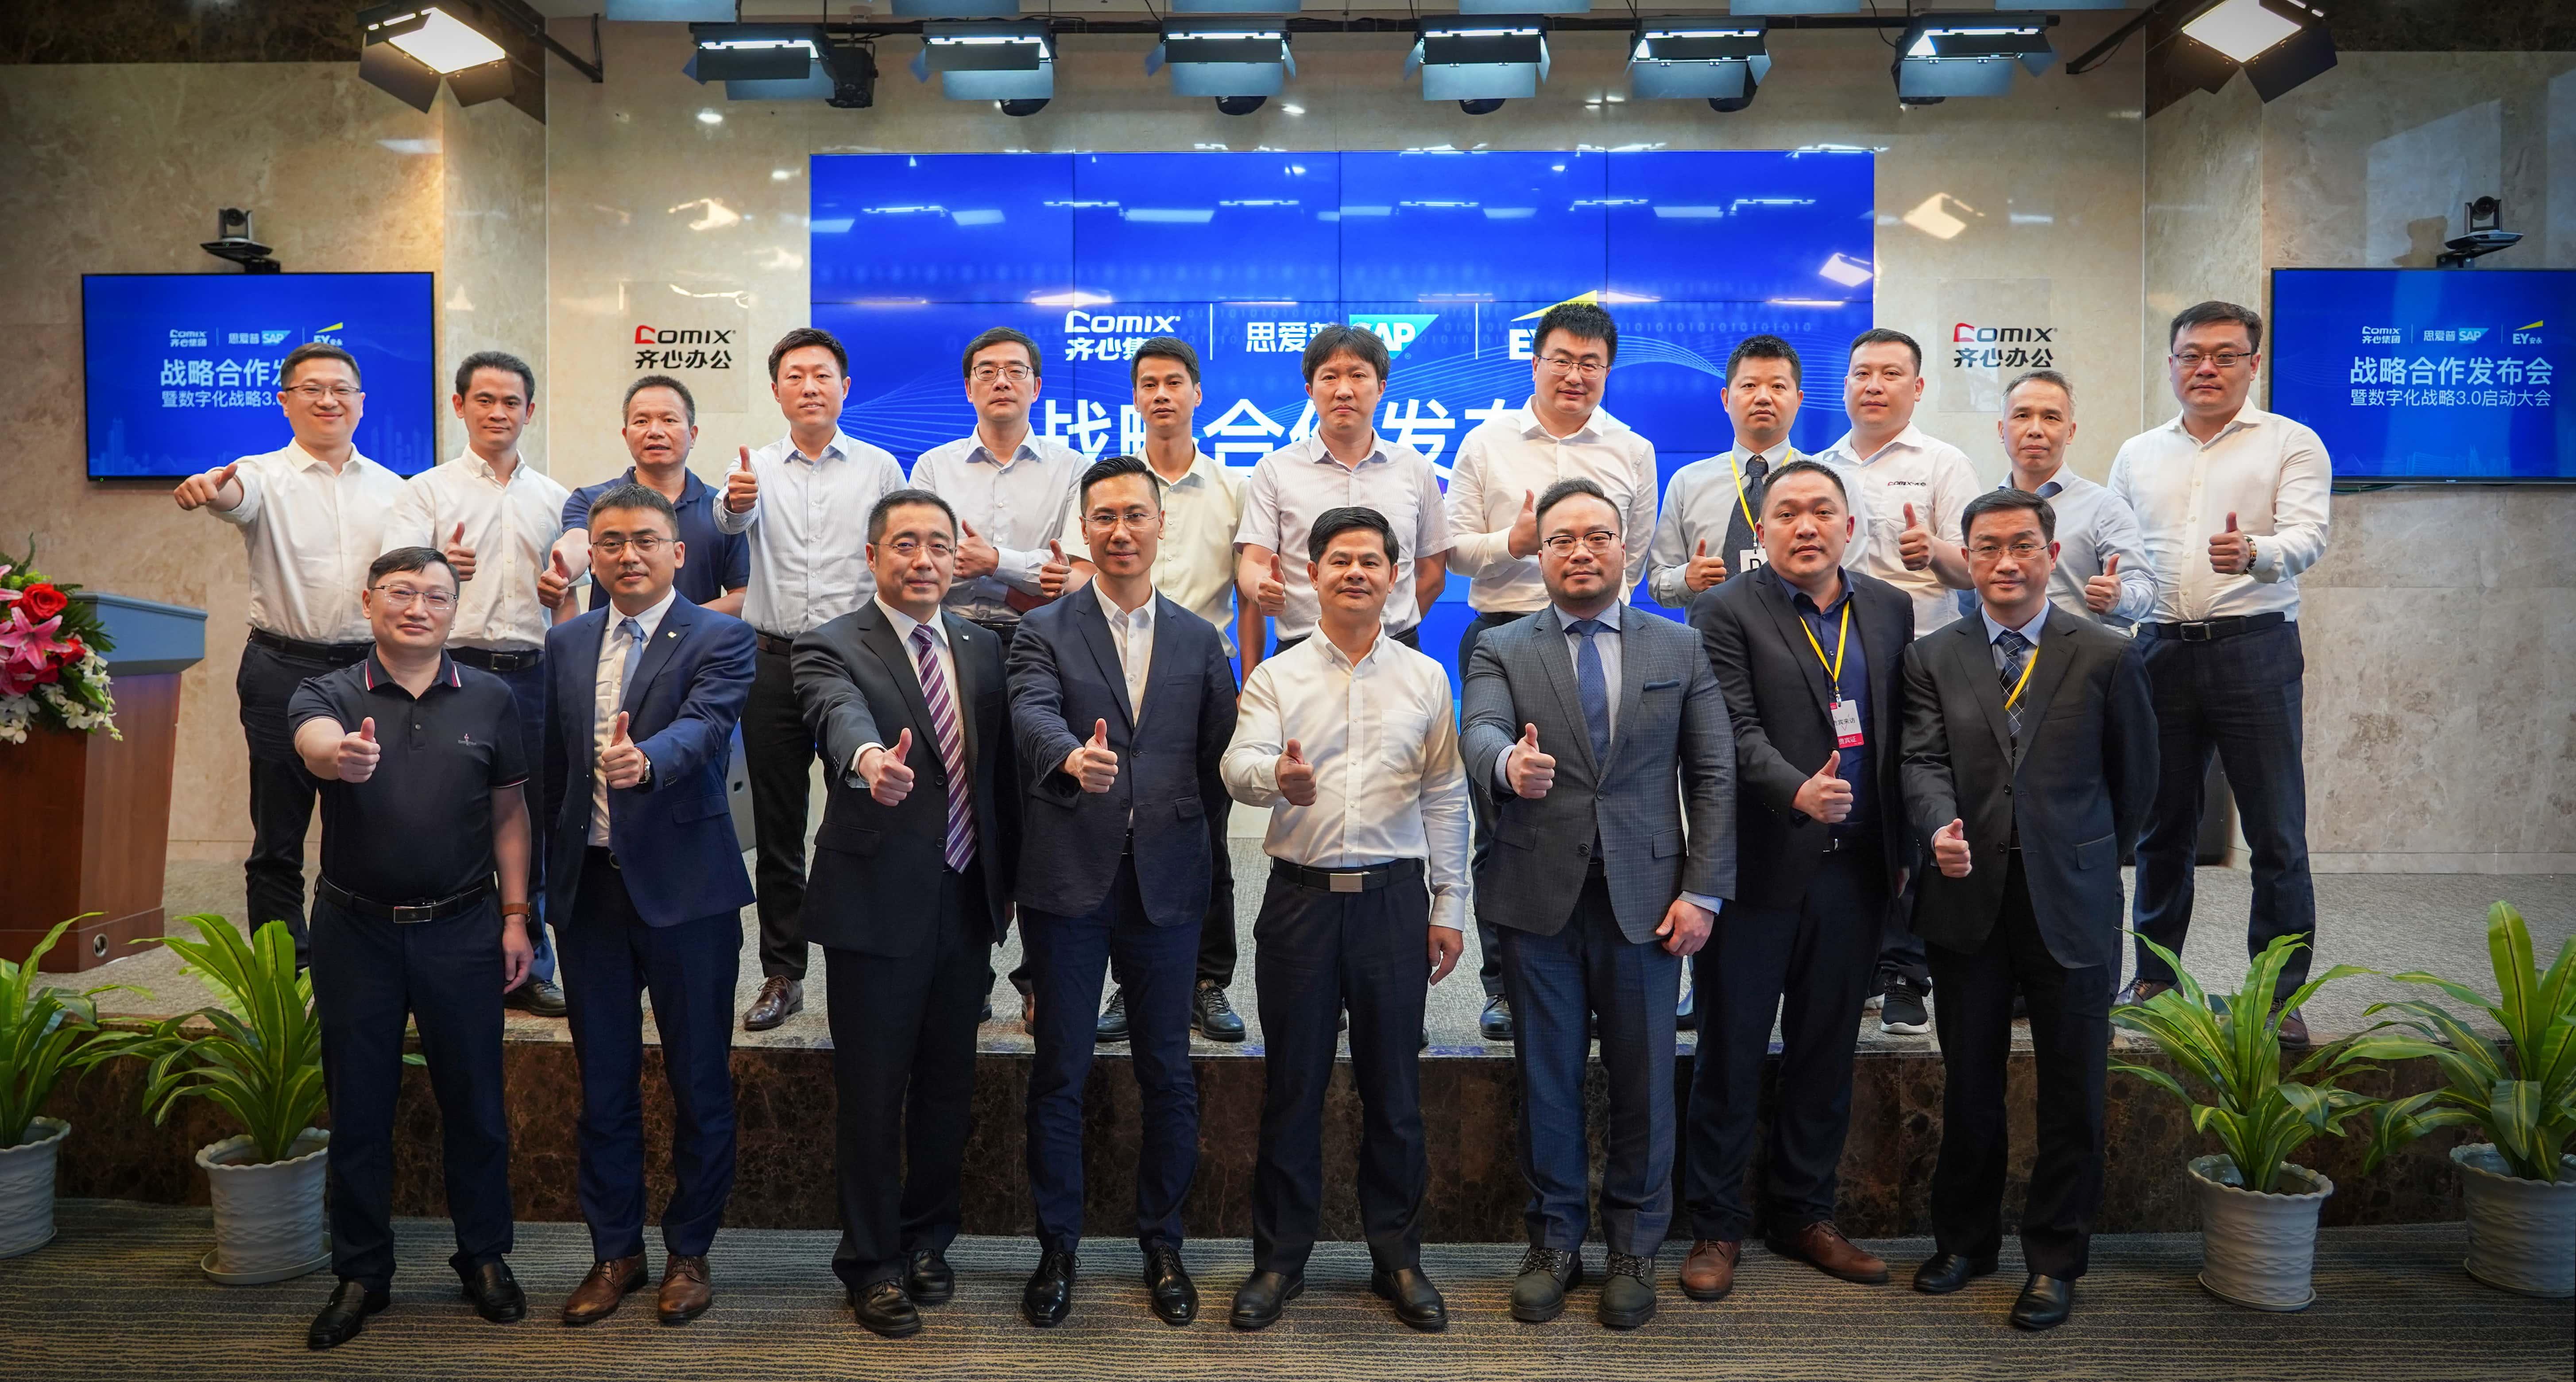 SAP与齐心集团再续战略合作,领航大办公行业数字化发展